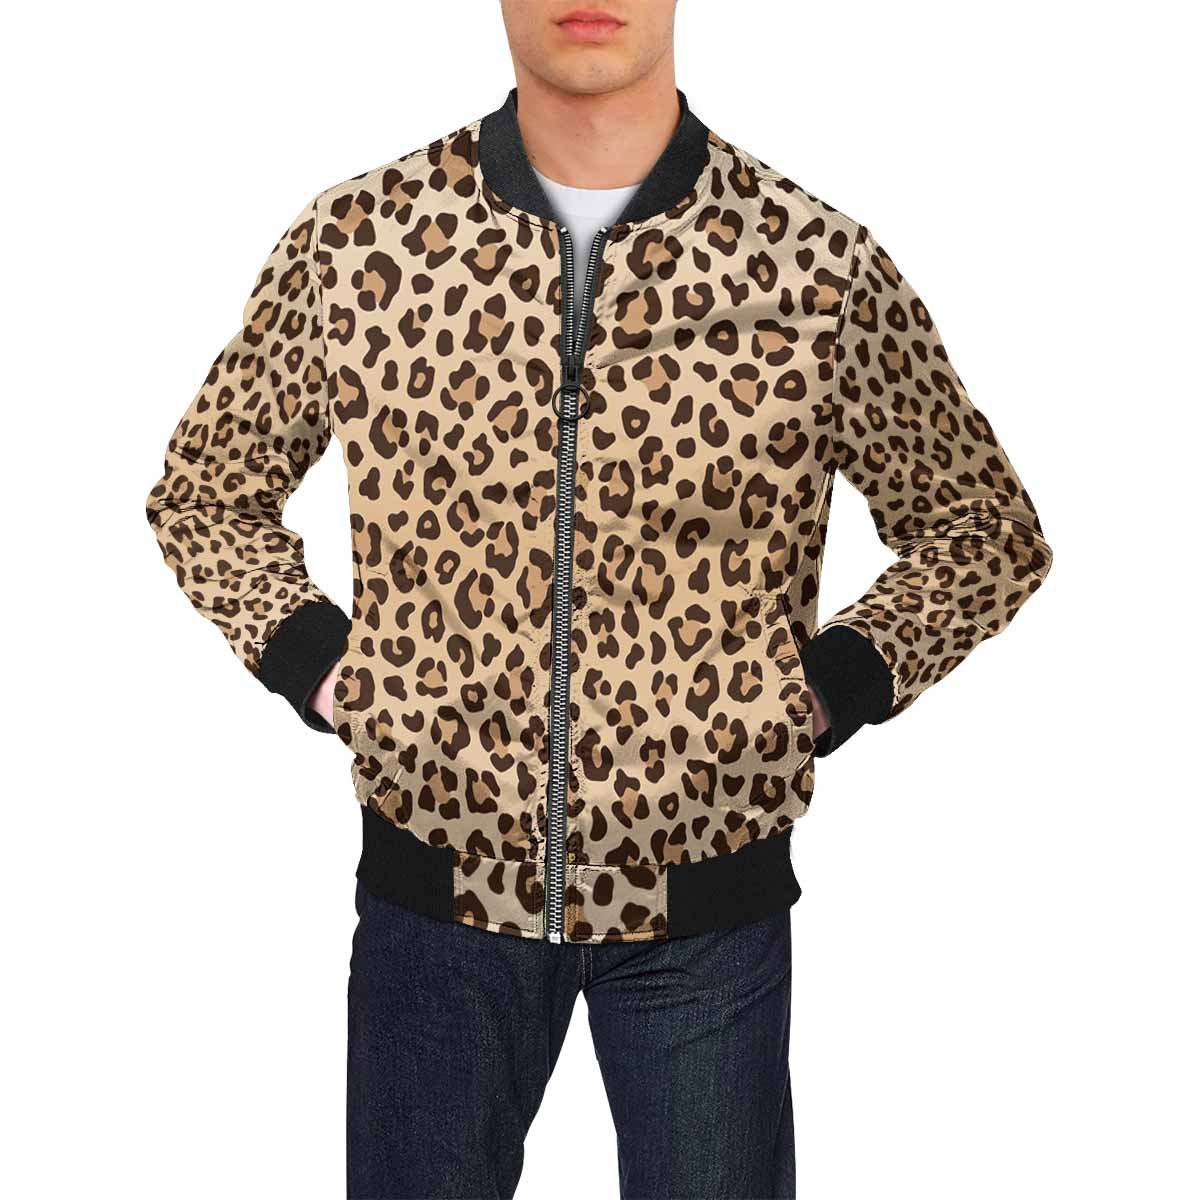 e765fa6bd692 INTERESTPRINT Leopard Animal Print Men's Active Lightweight Softshell  Zipper Bomber Jacket (XS-2XL) at Amazon Men's Clothing store: